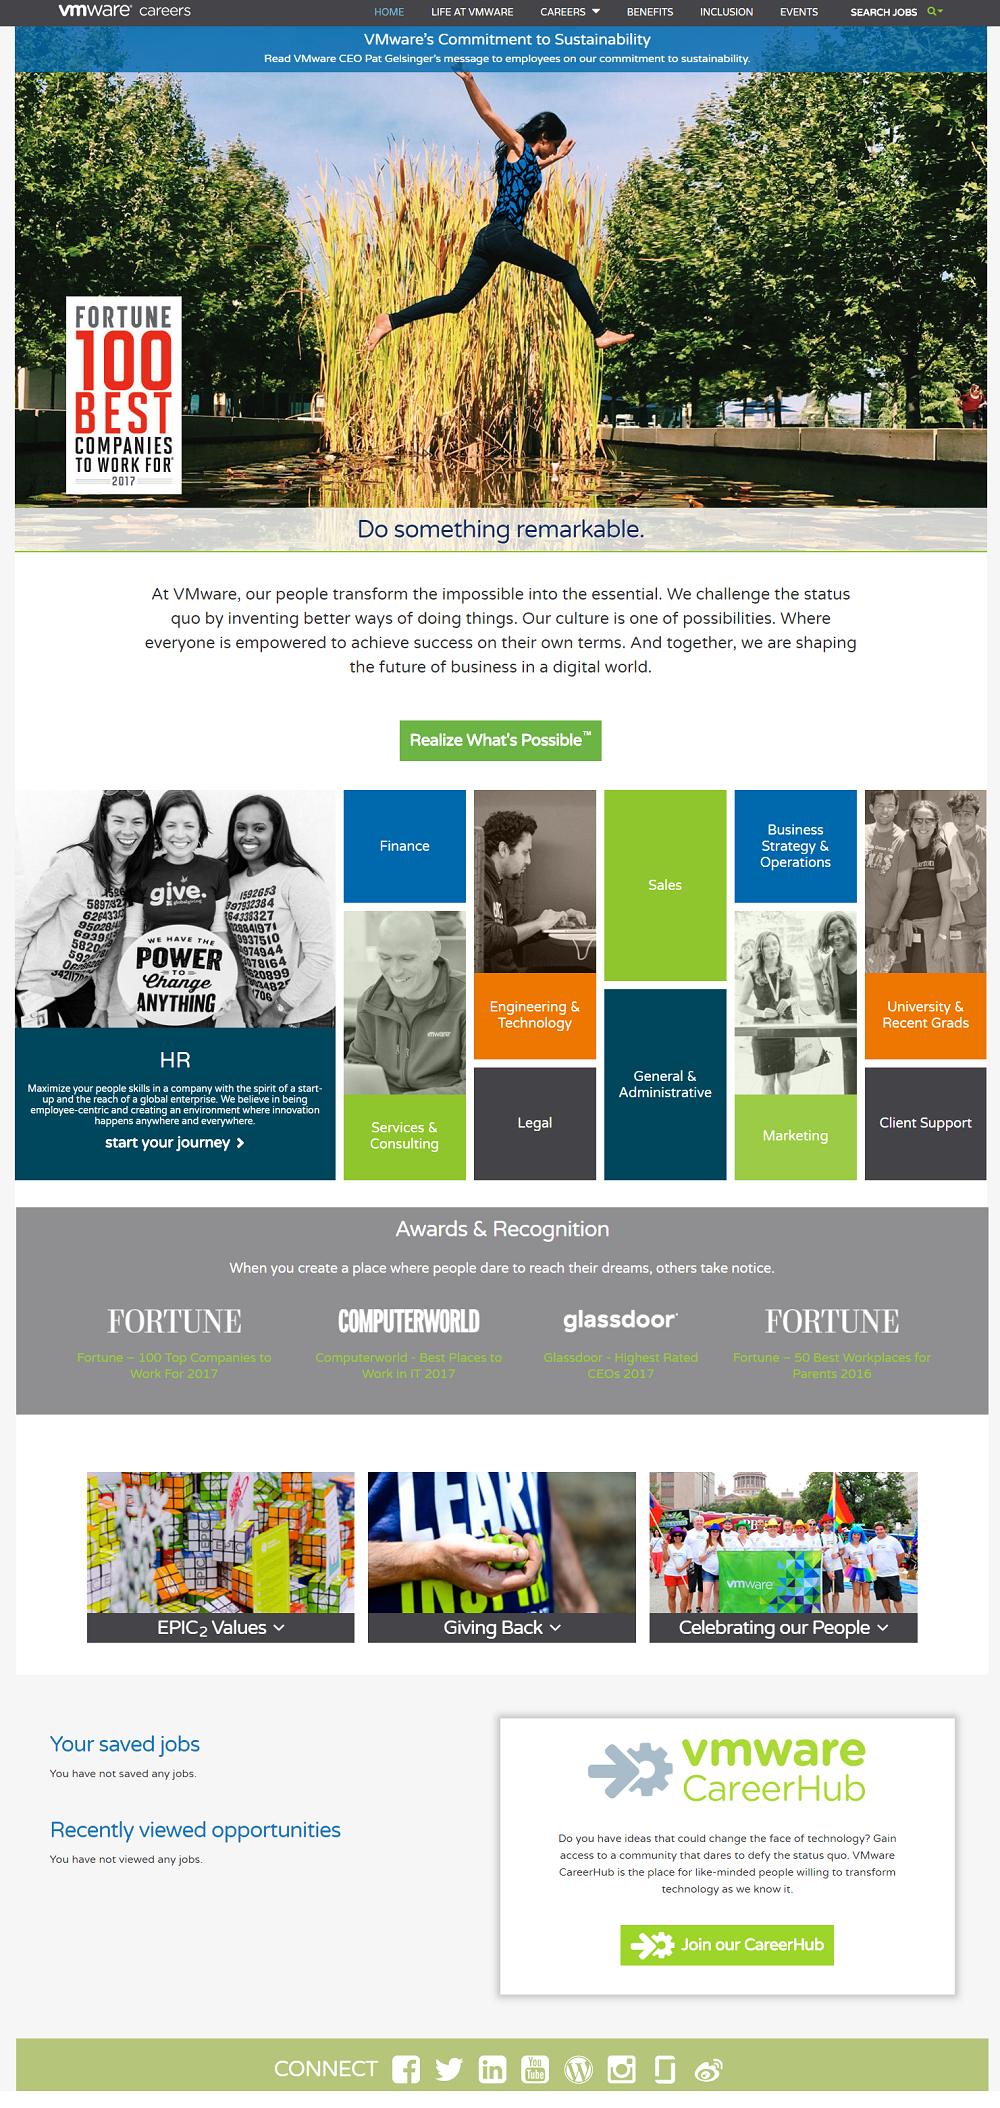 VMware Company Career Page